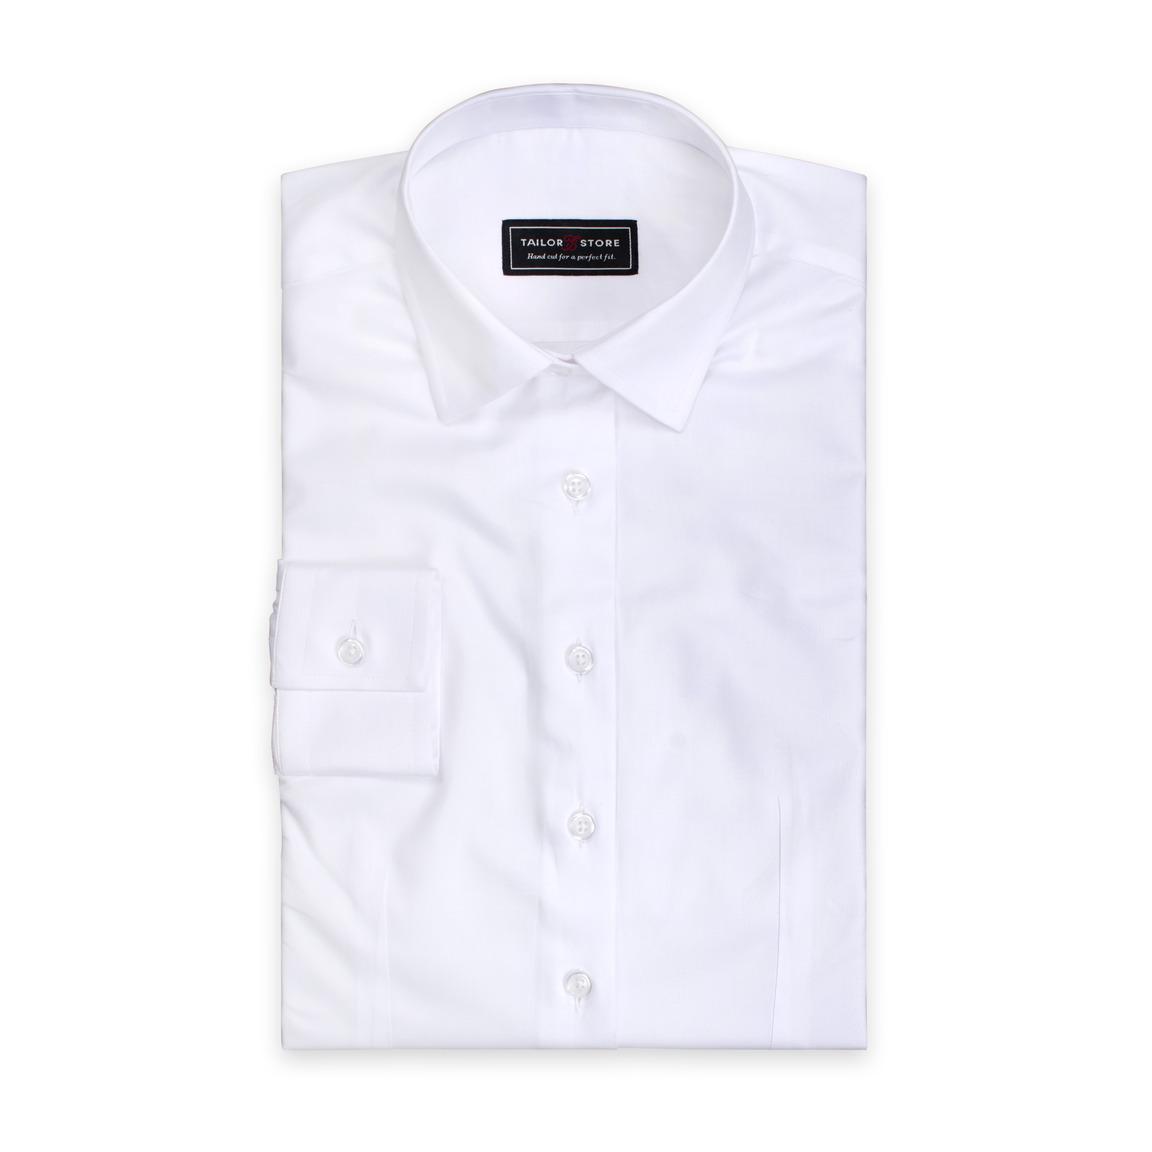 White Tailor Made Business Women S Shirt